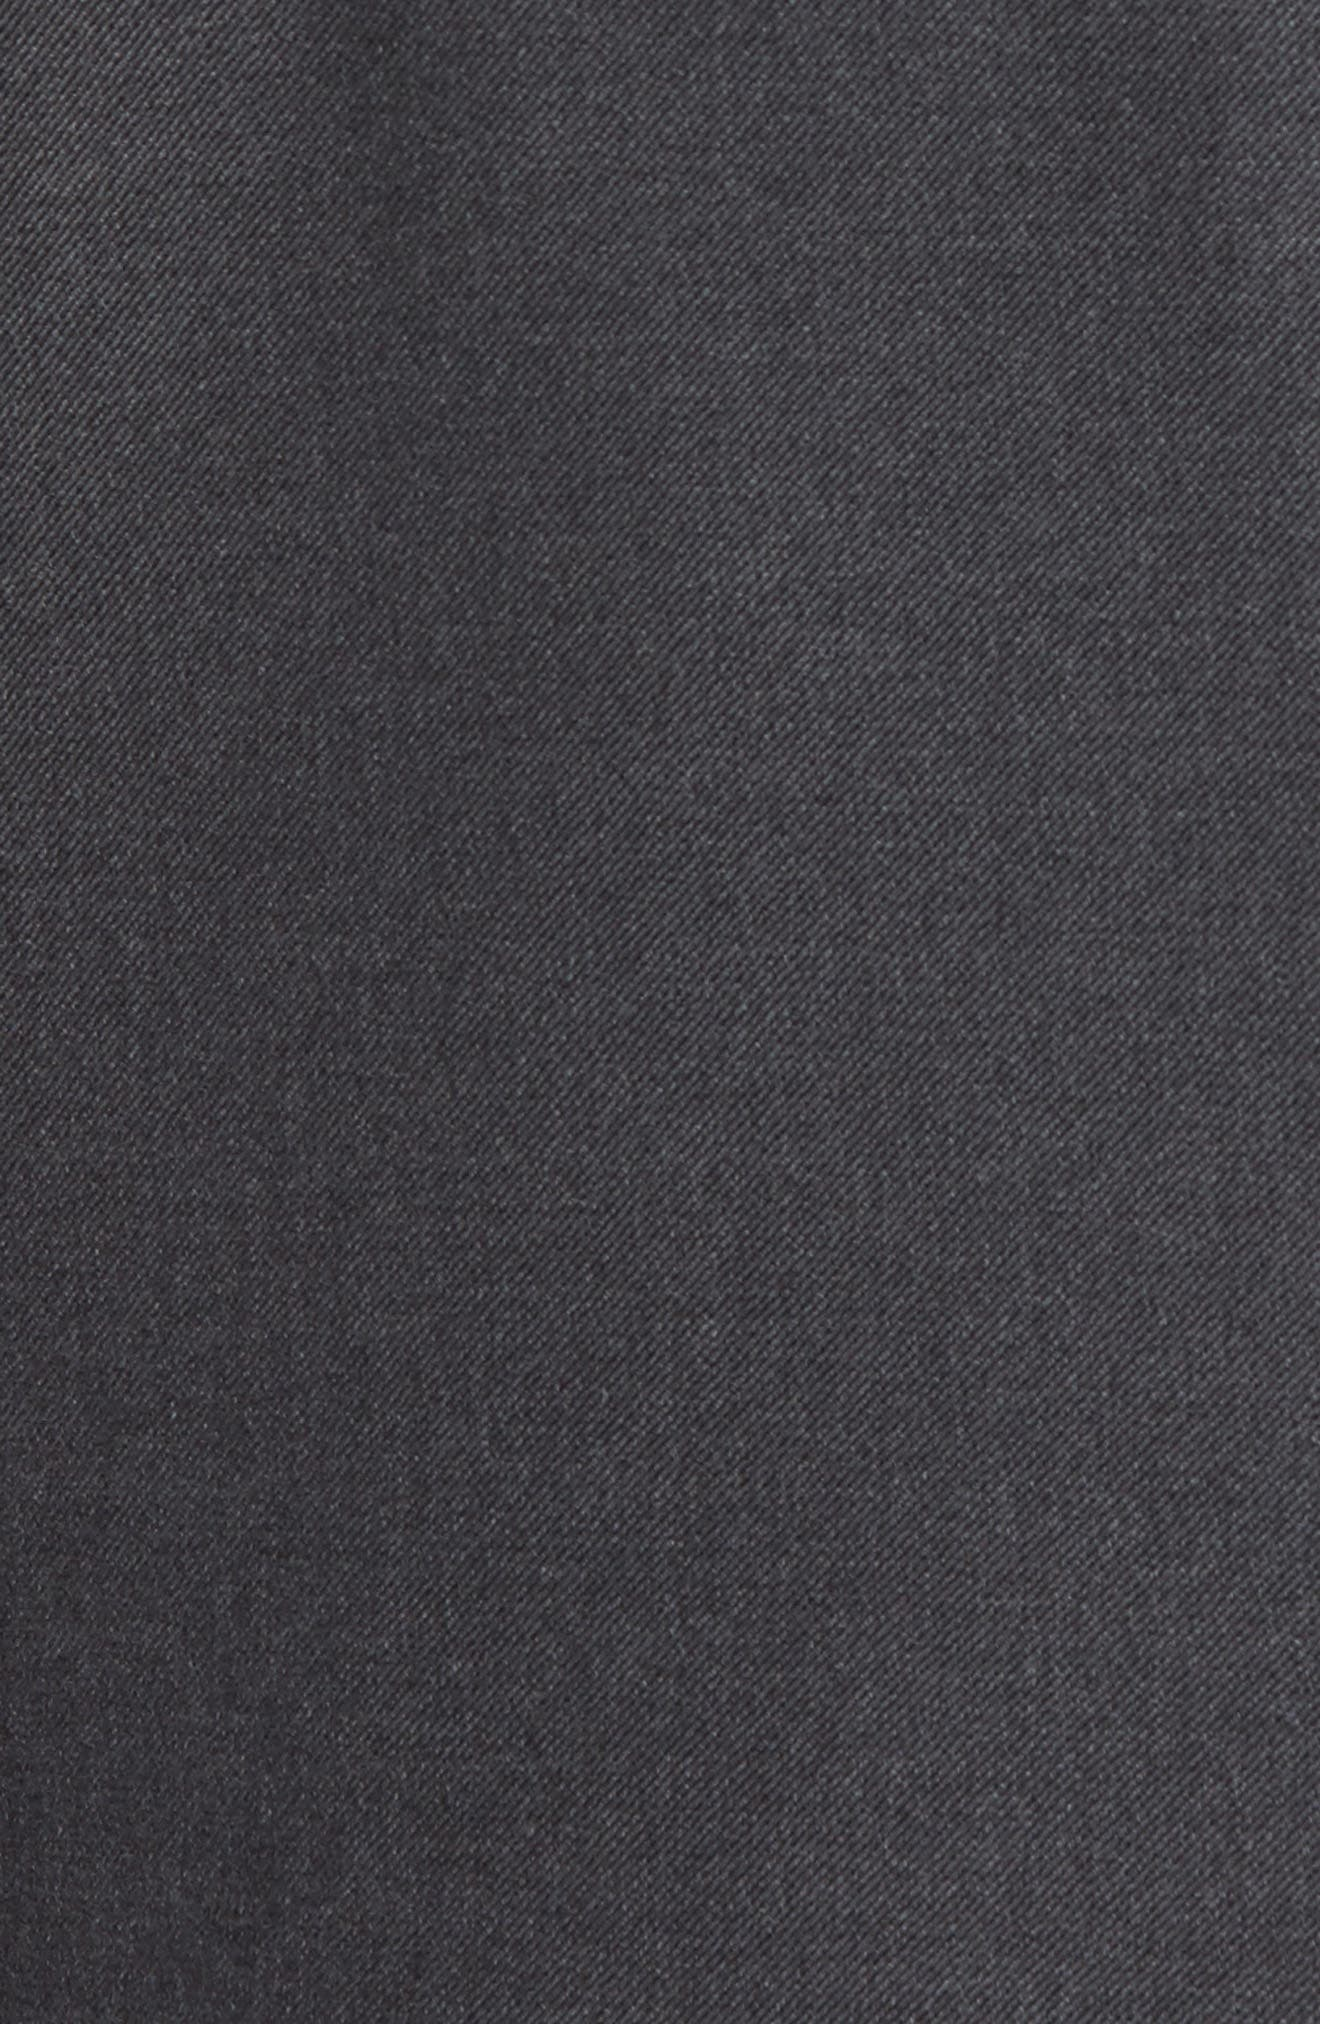 HICKEY FREEMAN, Classic B Fit Loro Piana Wool Suit, Alternate thumbnail 7, color, GREY